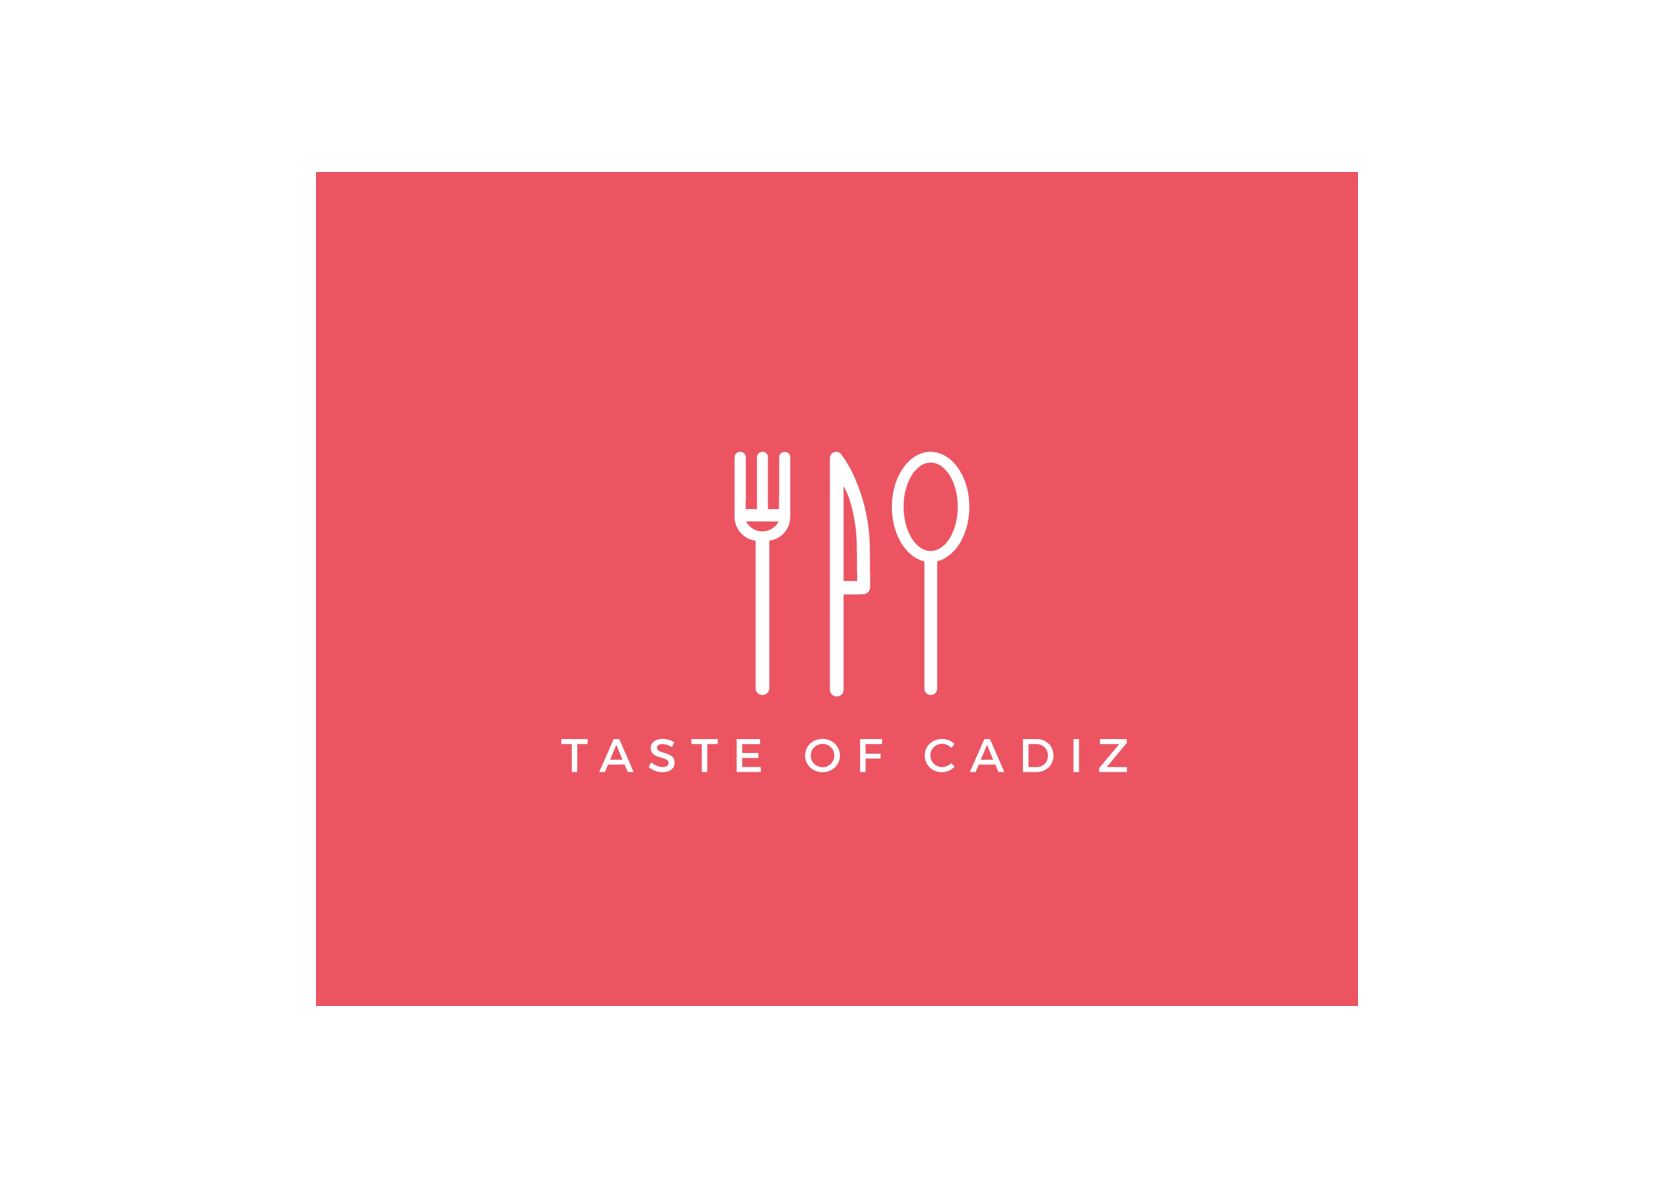 Taste of Cadiz